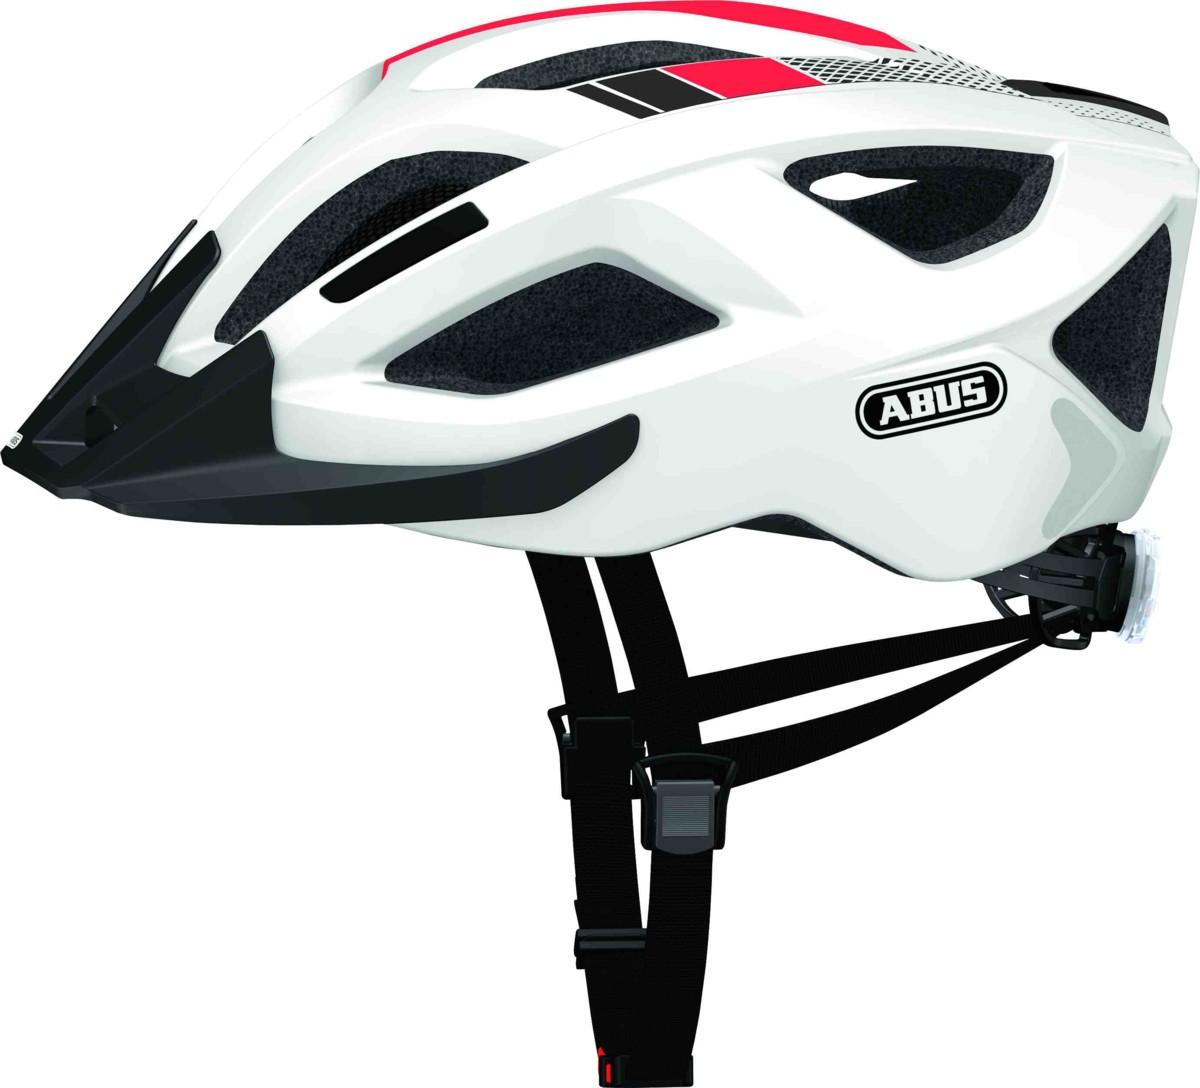 ABUS Aduro 2.0 race white - Aduro 2.0 race white M